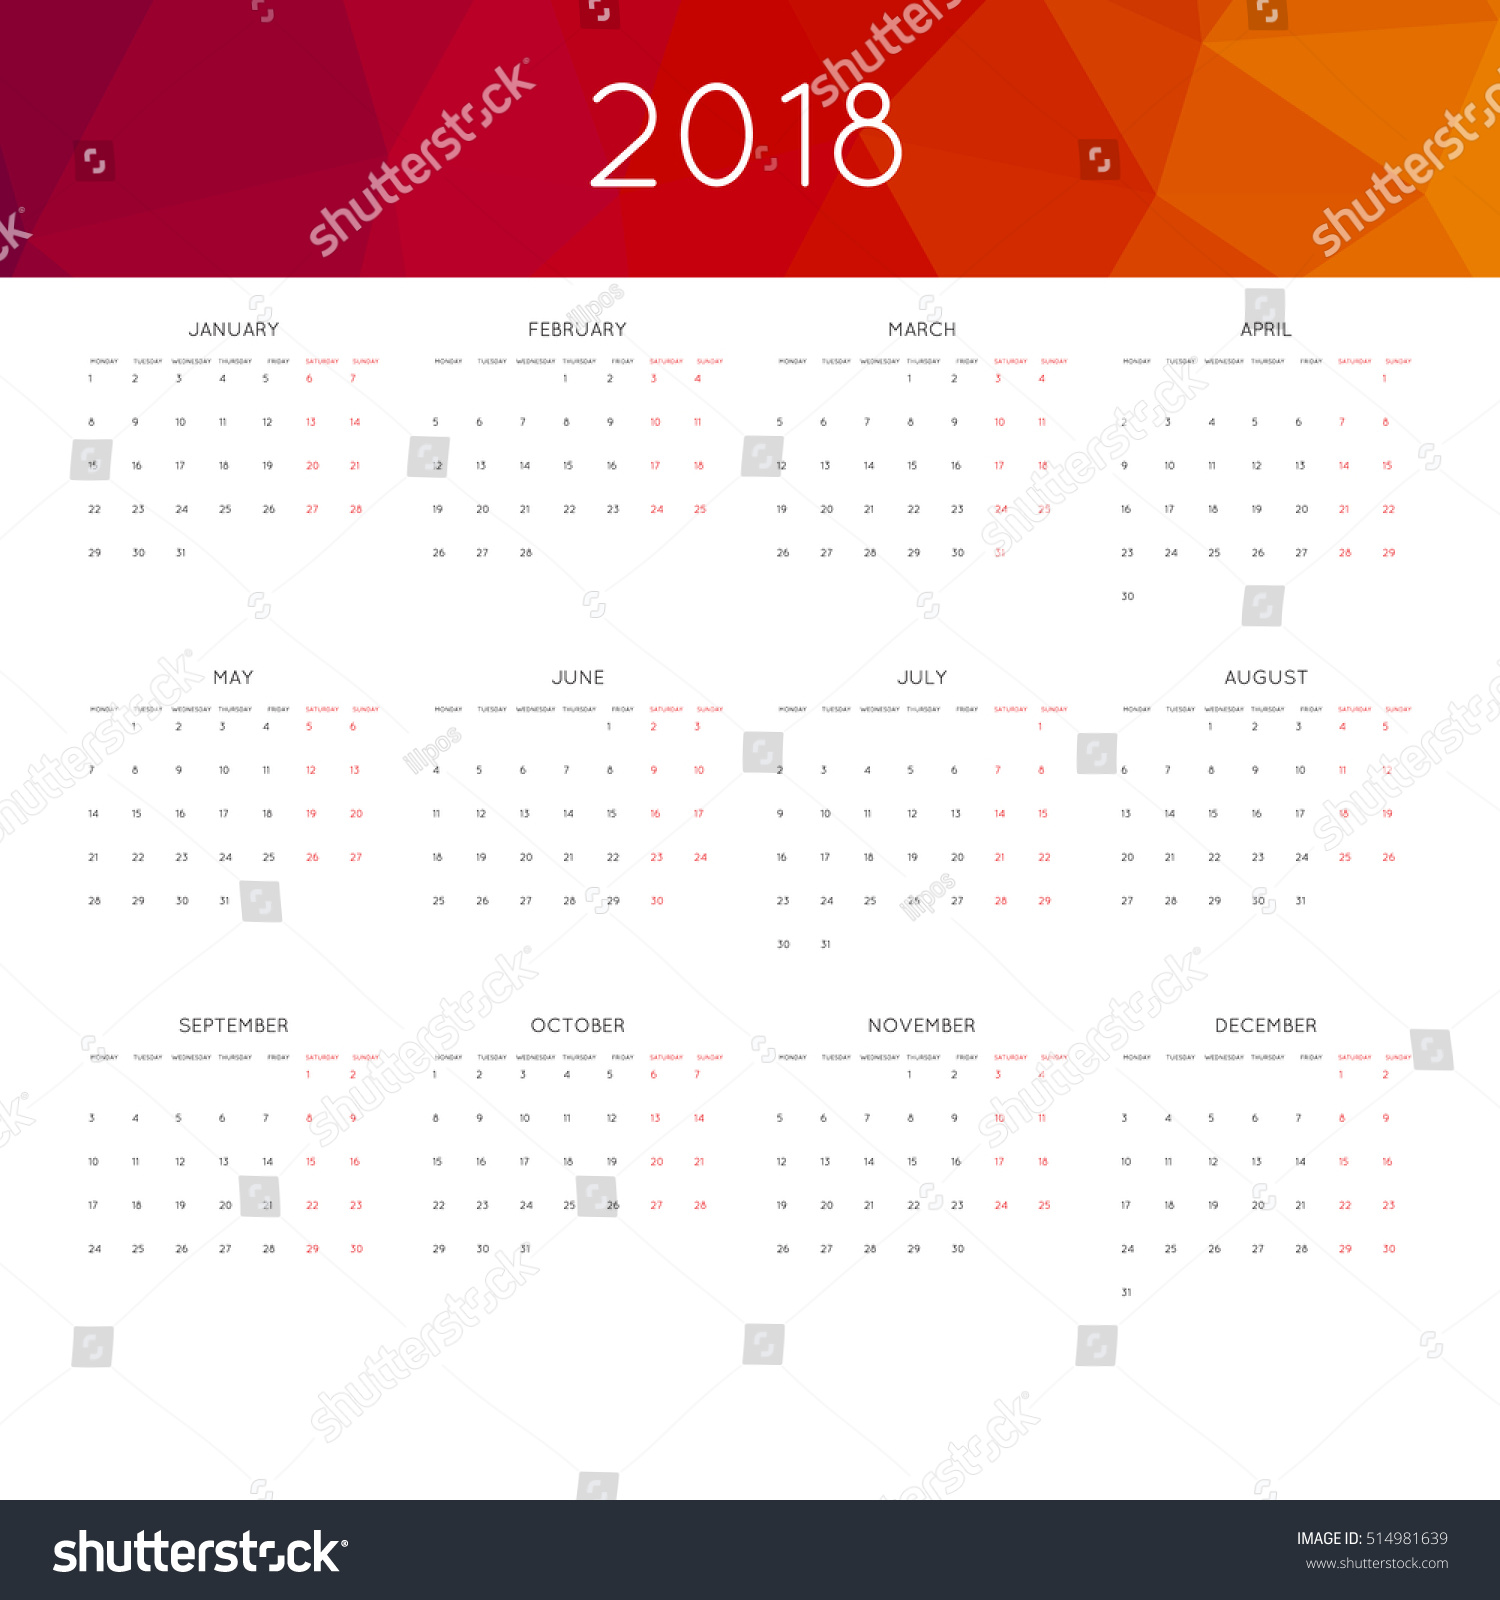 May Calendar Header : Calendar year simple style abstract stock vector